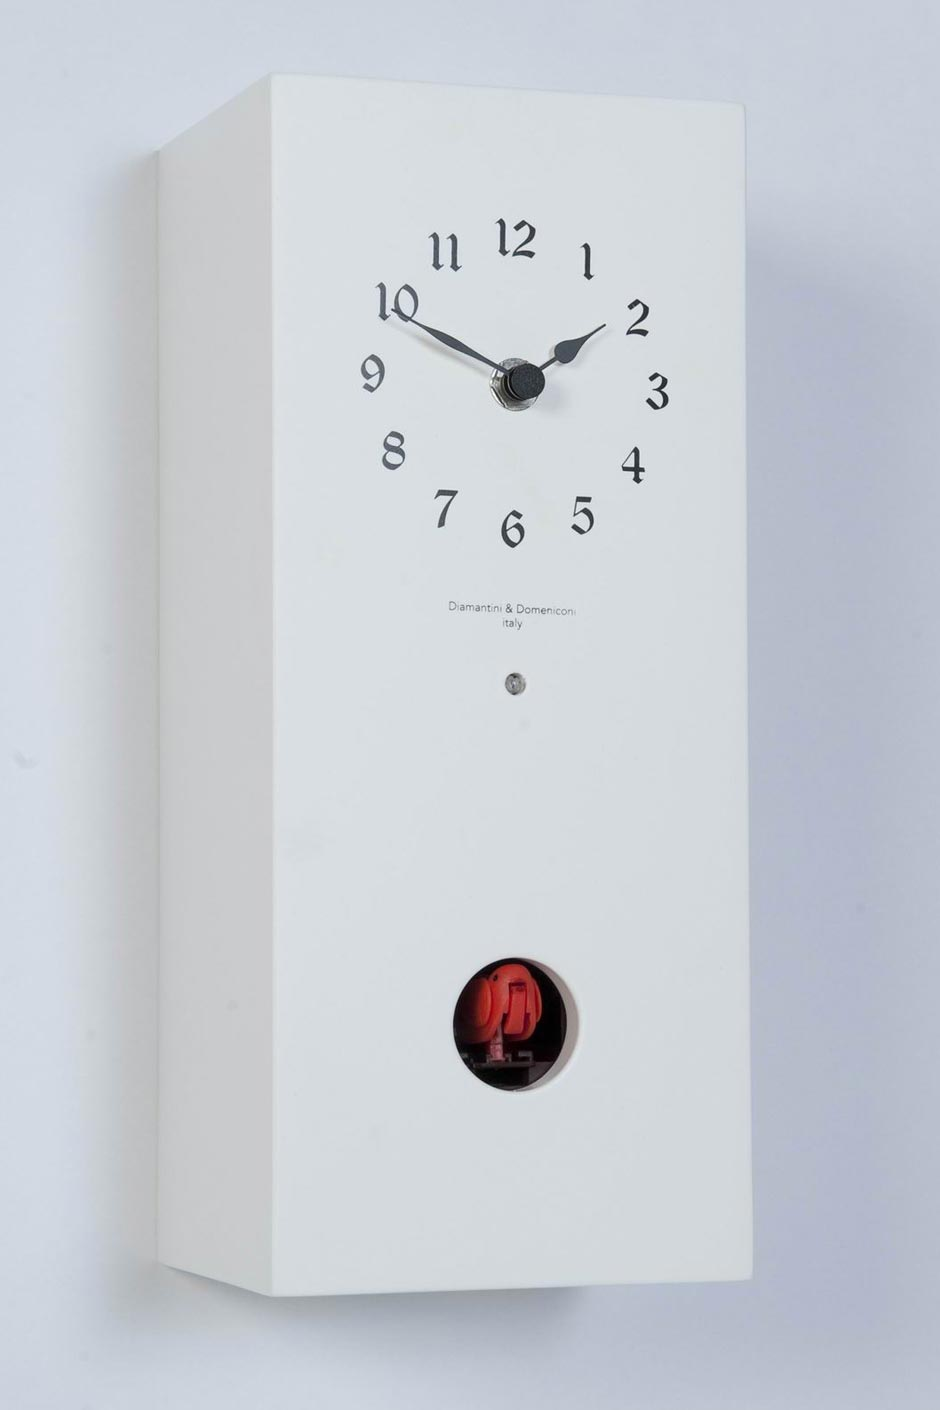 Arcoiris nature blanc pendule coucou en bois laqu blanc horloges et pendules design - Koekoeksklok diamantini ...